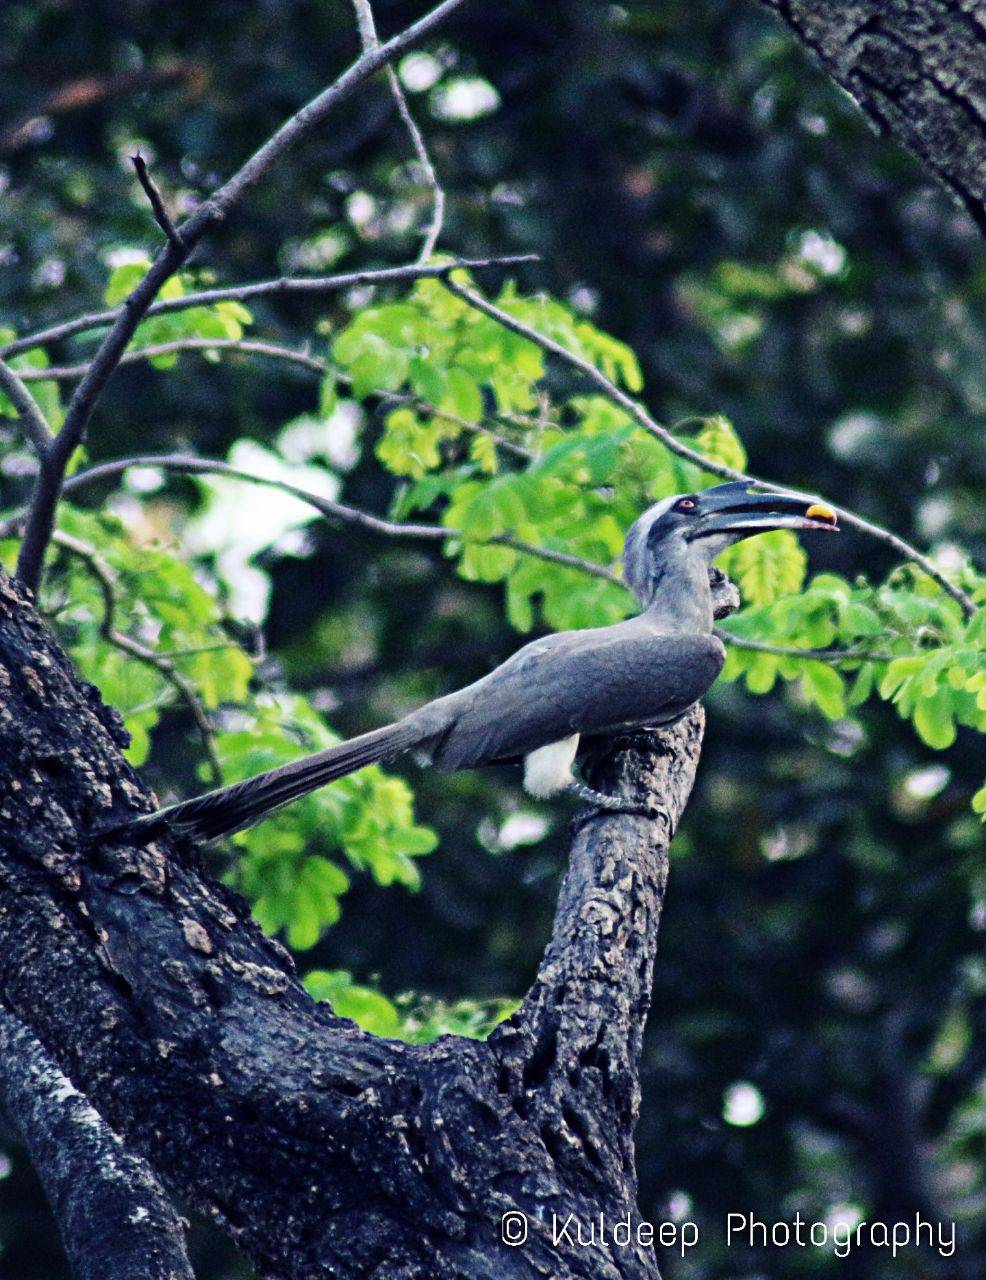 Bird Hornbill Wallpaper By Iking357 8e Free On Zedge